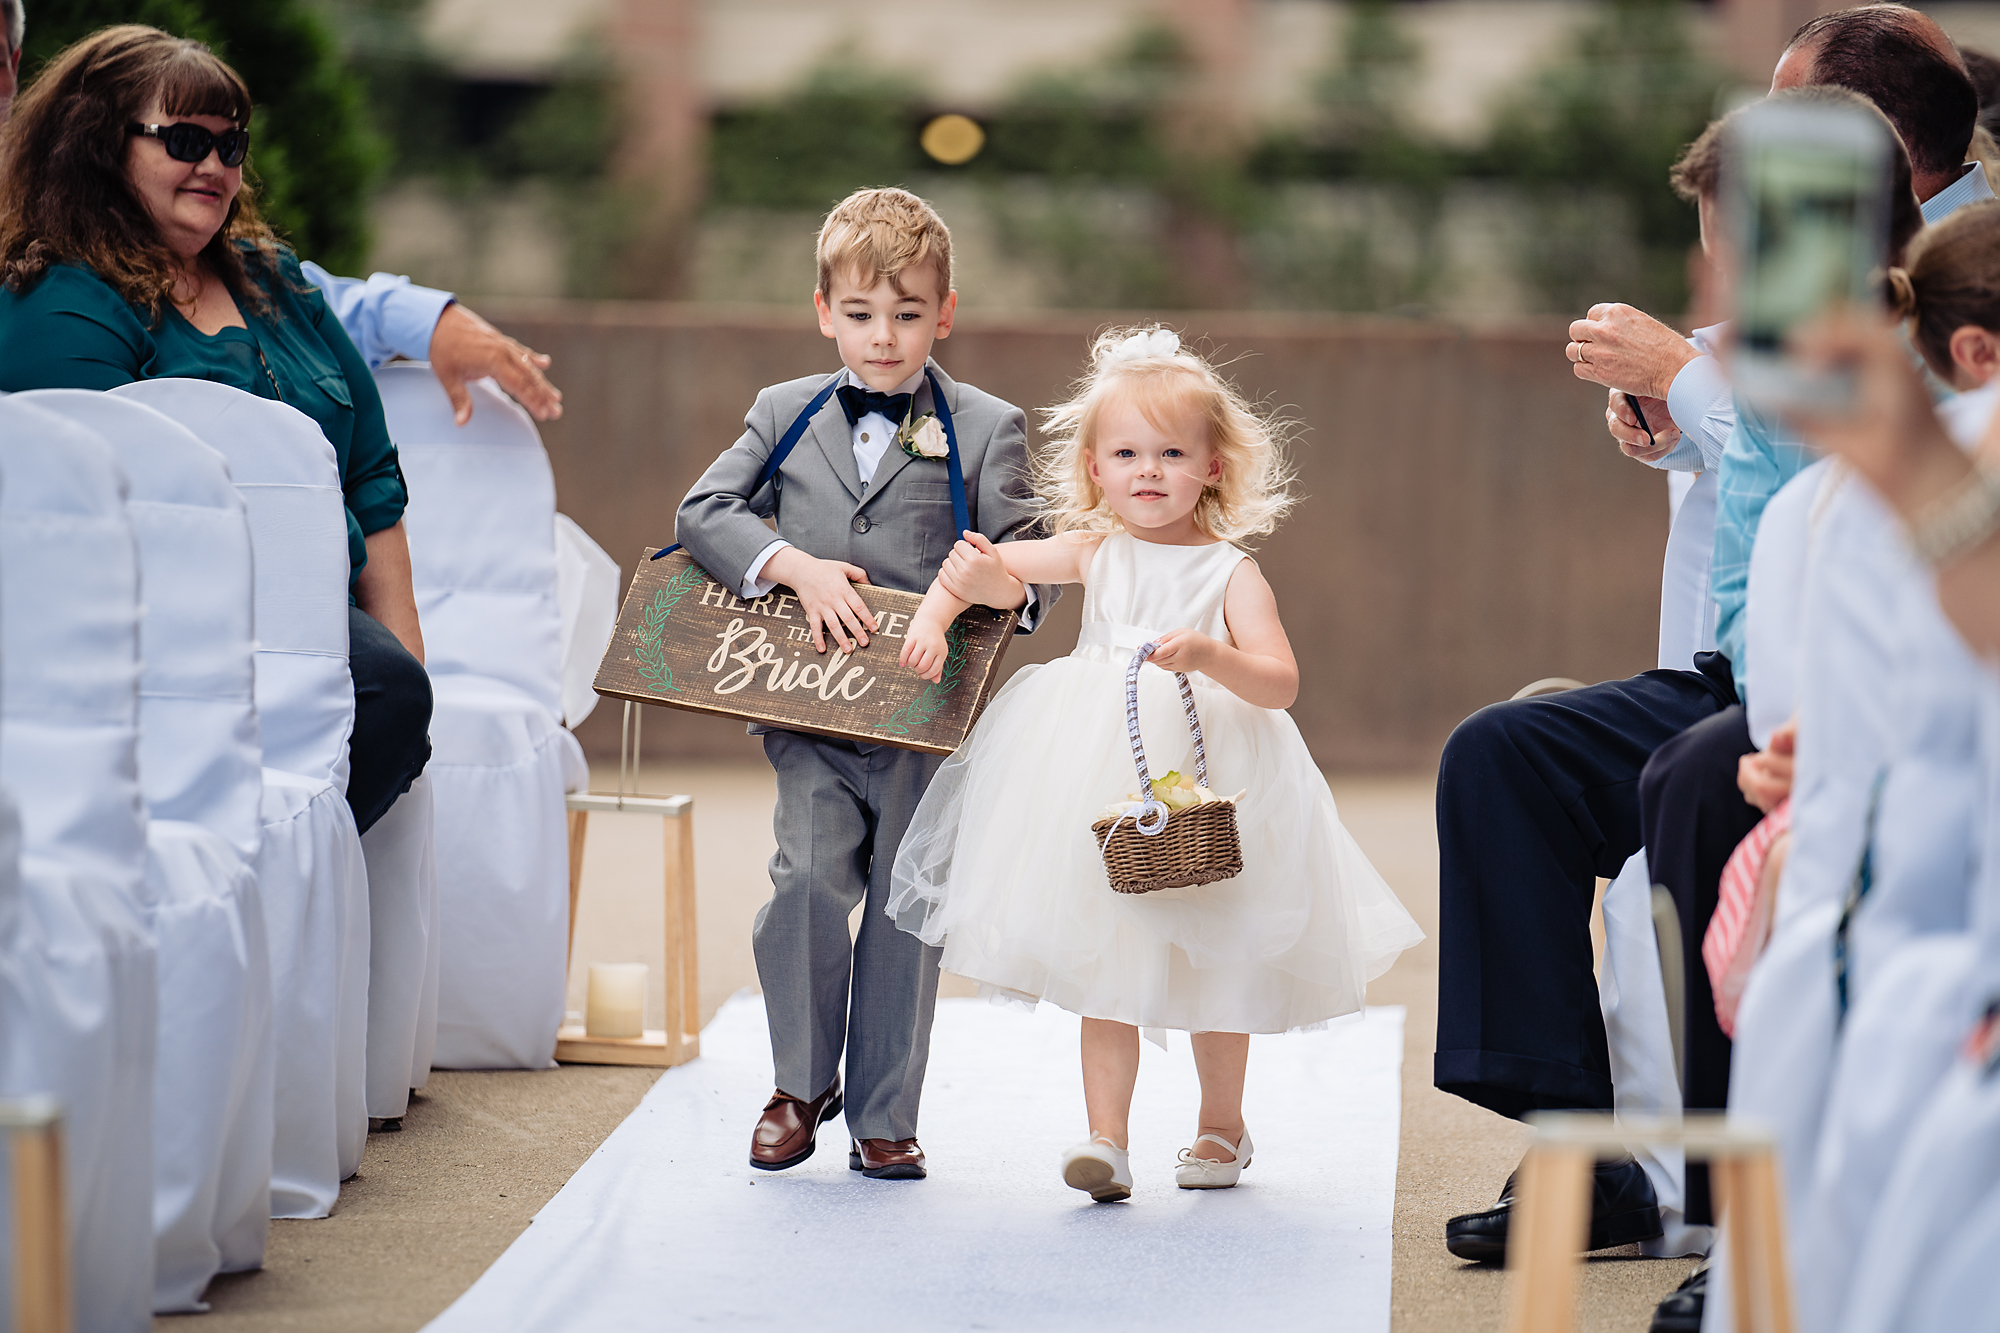 Embassy-Suites-Rivercenter-Wedding-Photography-18.jpg